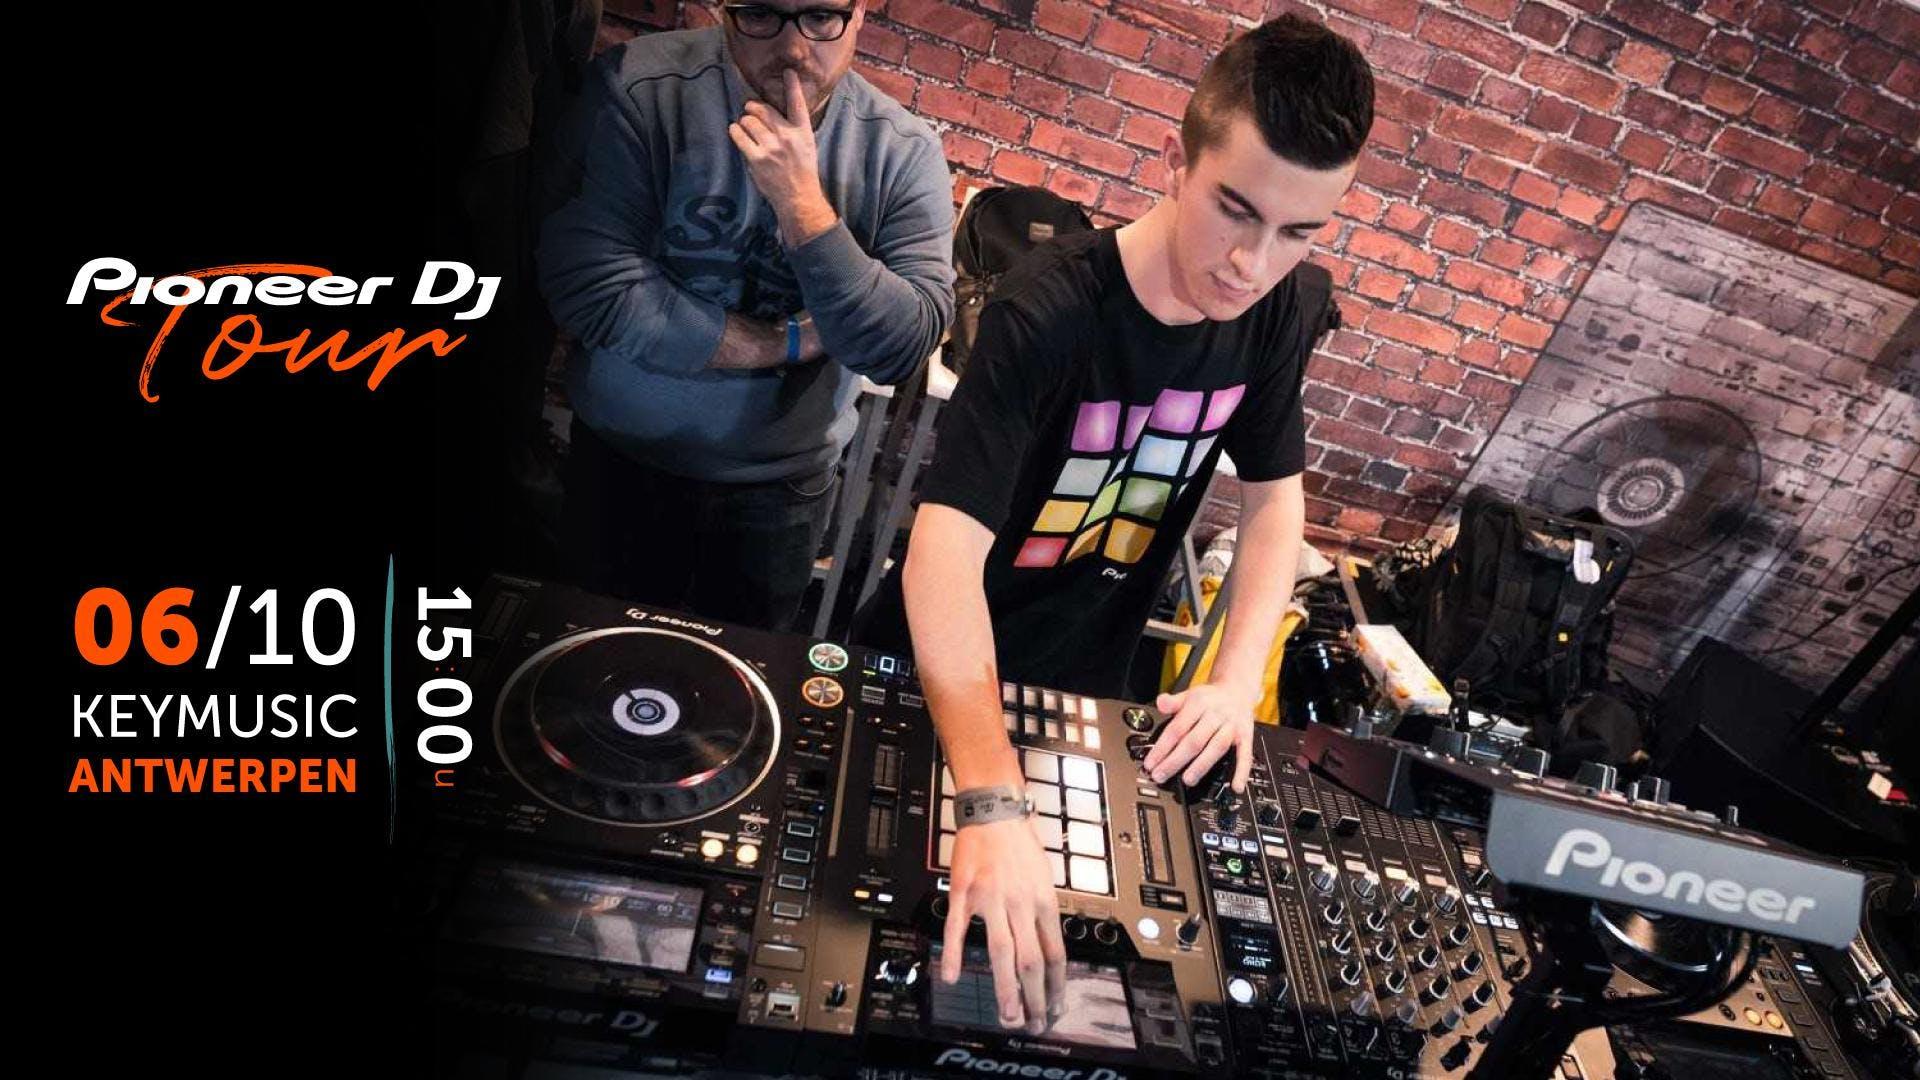 Pioneer DJ tour KEYMUSIC Antwerpen